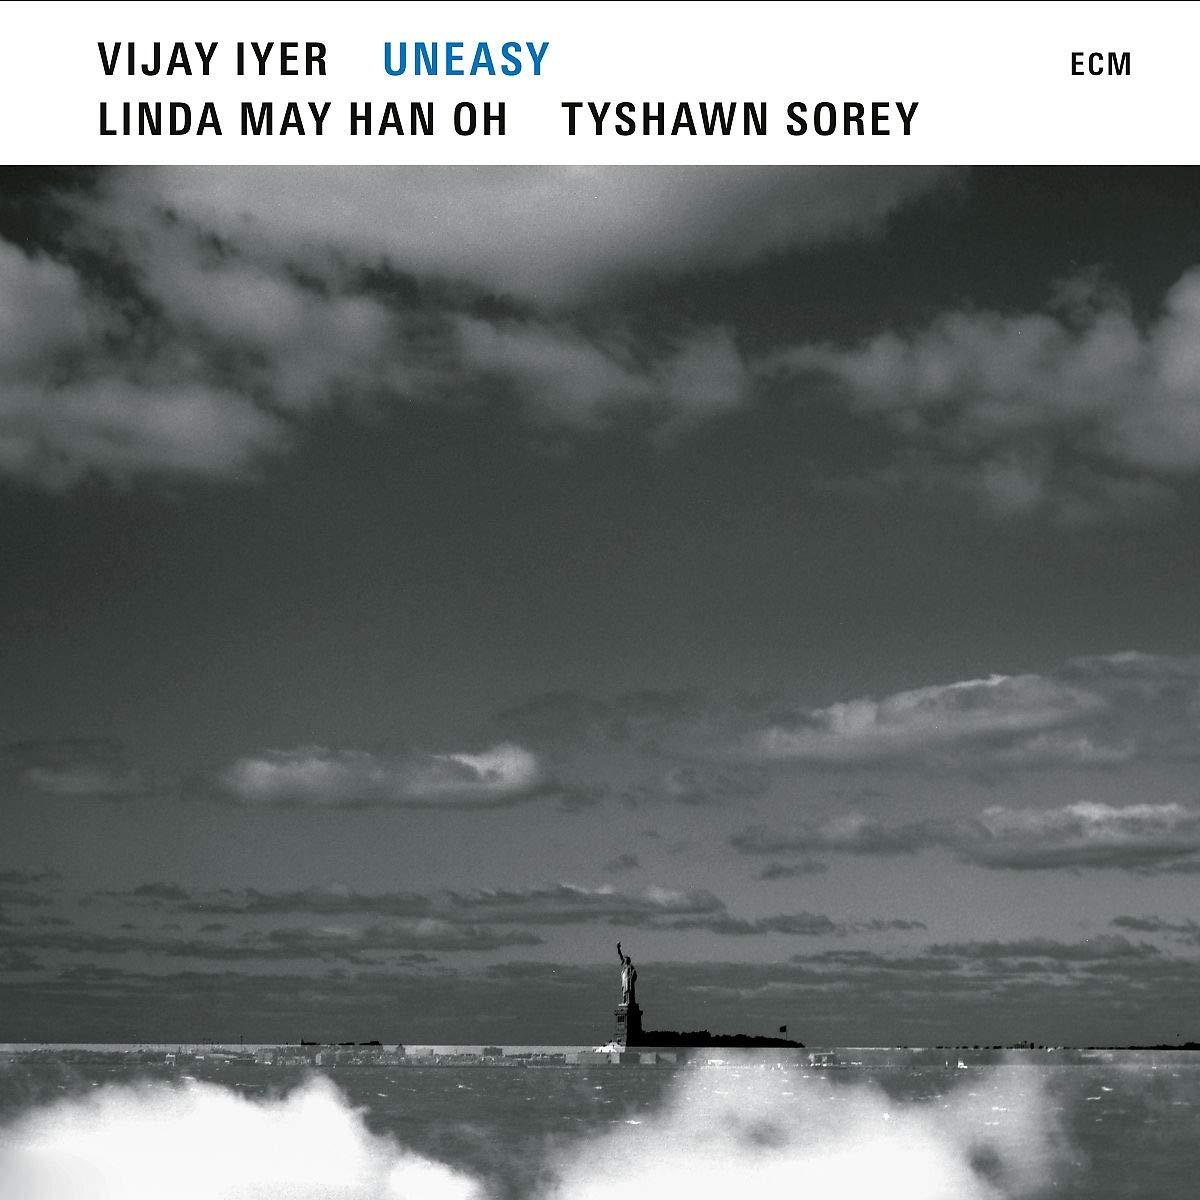 VIJAY IYER - Uneasy cover